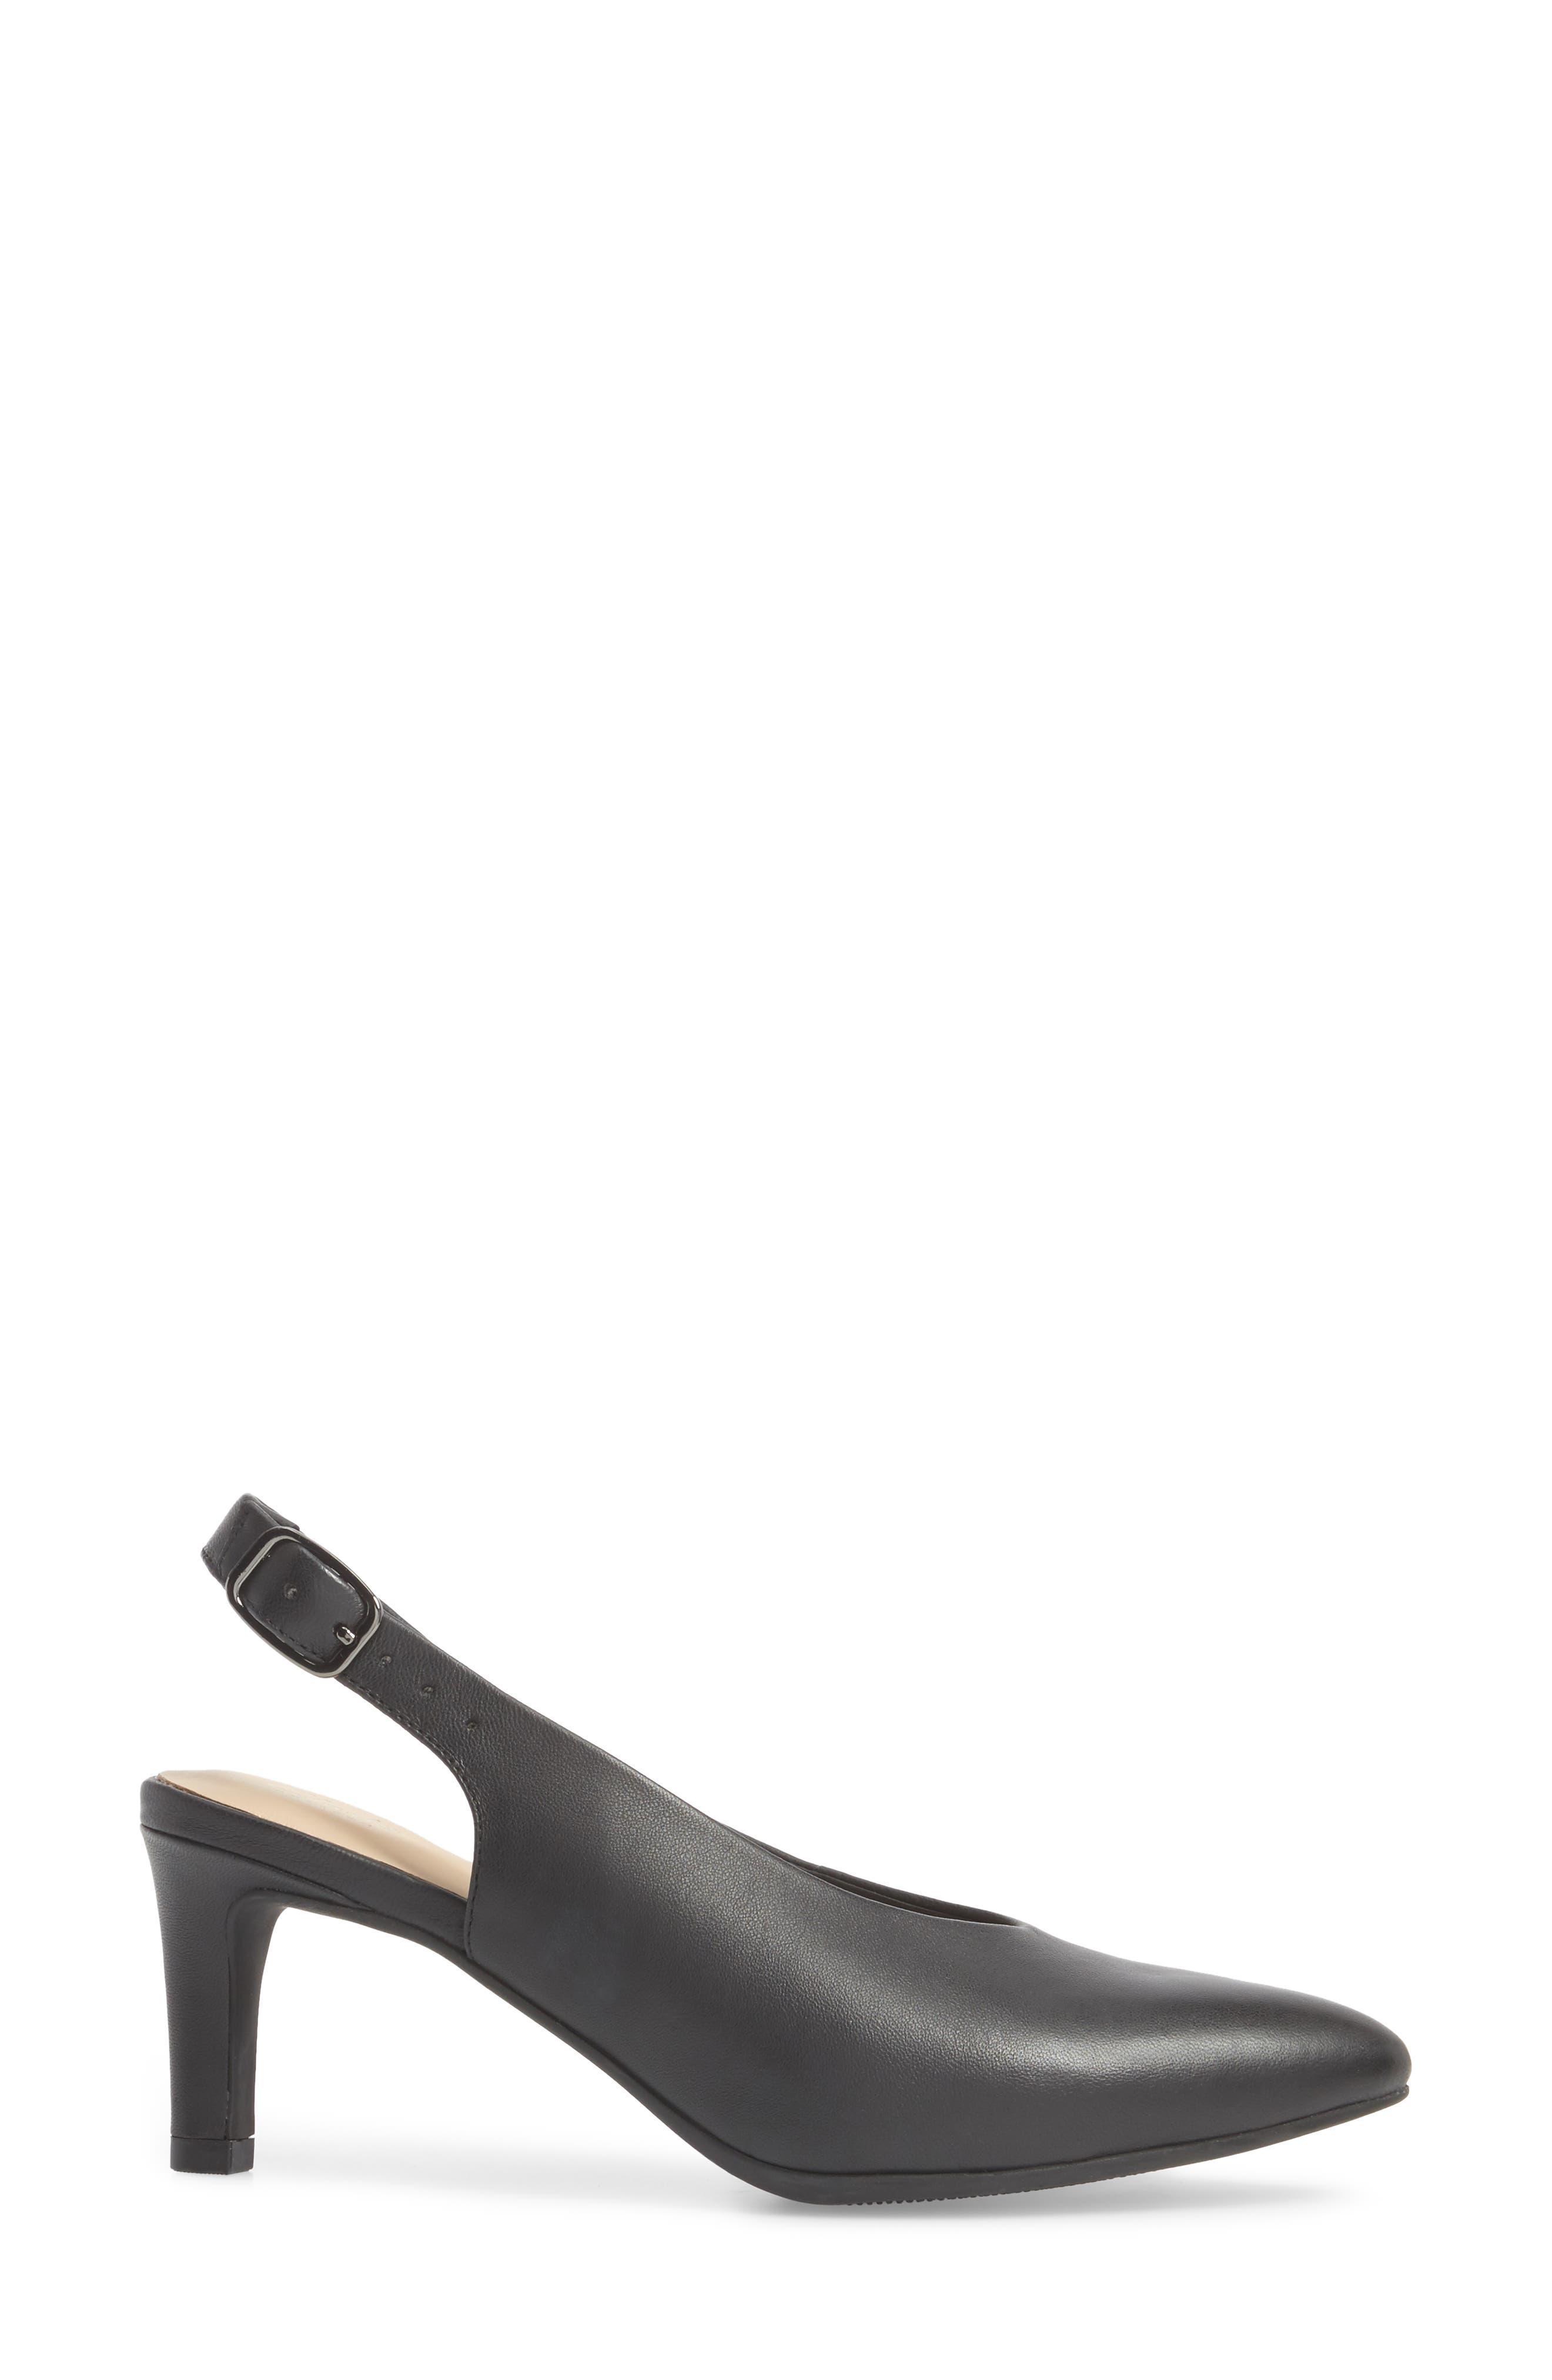 Calla Violet Kitten Heel Pump,                             Alternate thumbnail 3, color,                             Black Leather